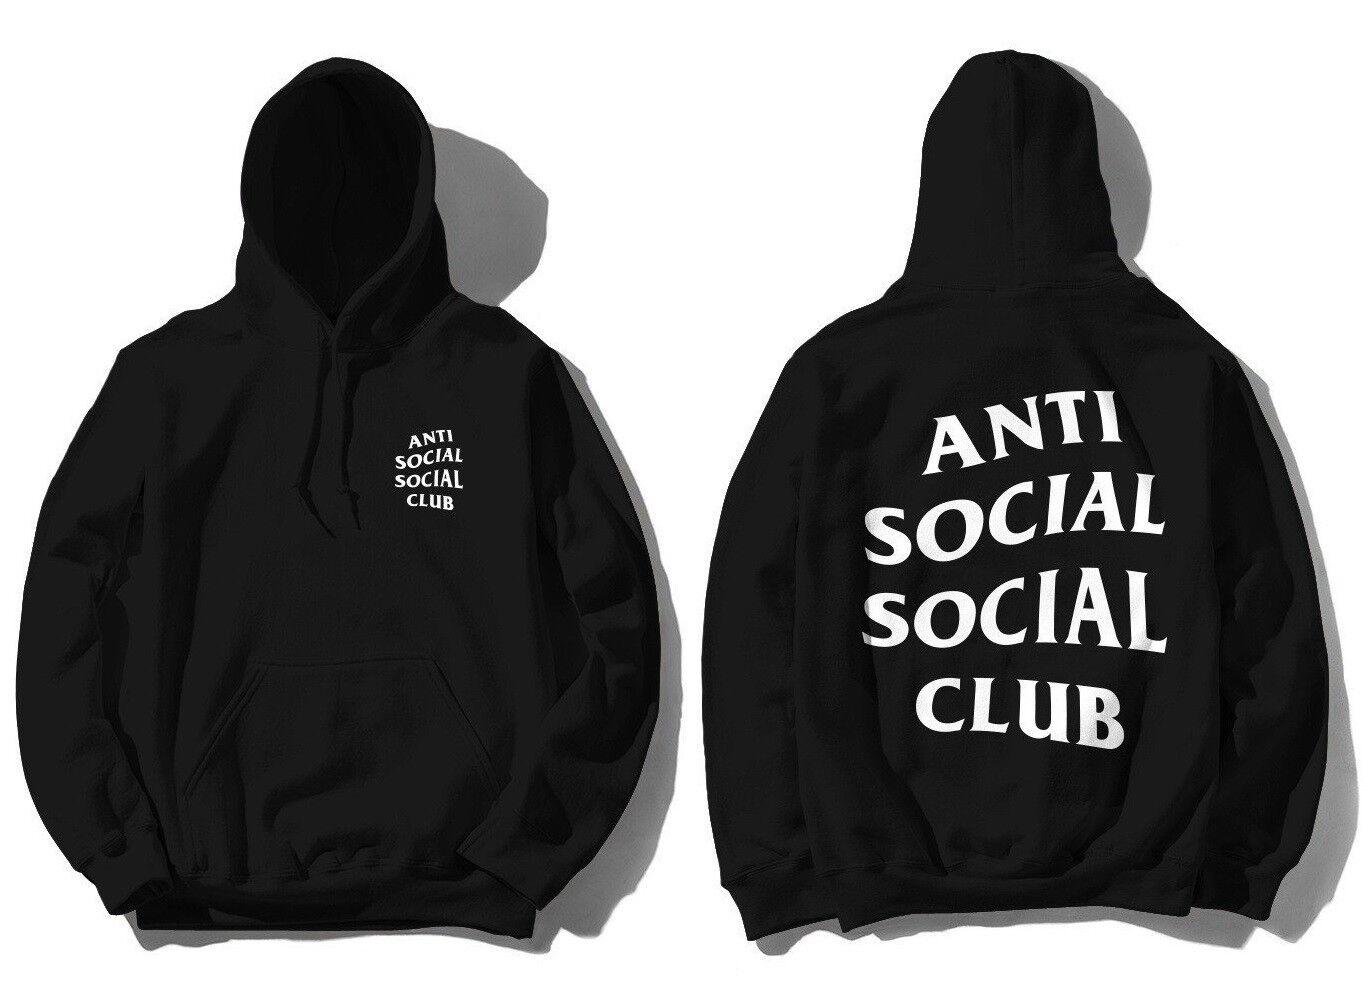 DS SS20 Anti Social Social Club ASSC White logo Mind Games Black Hoodie in hand